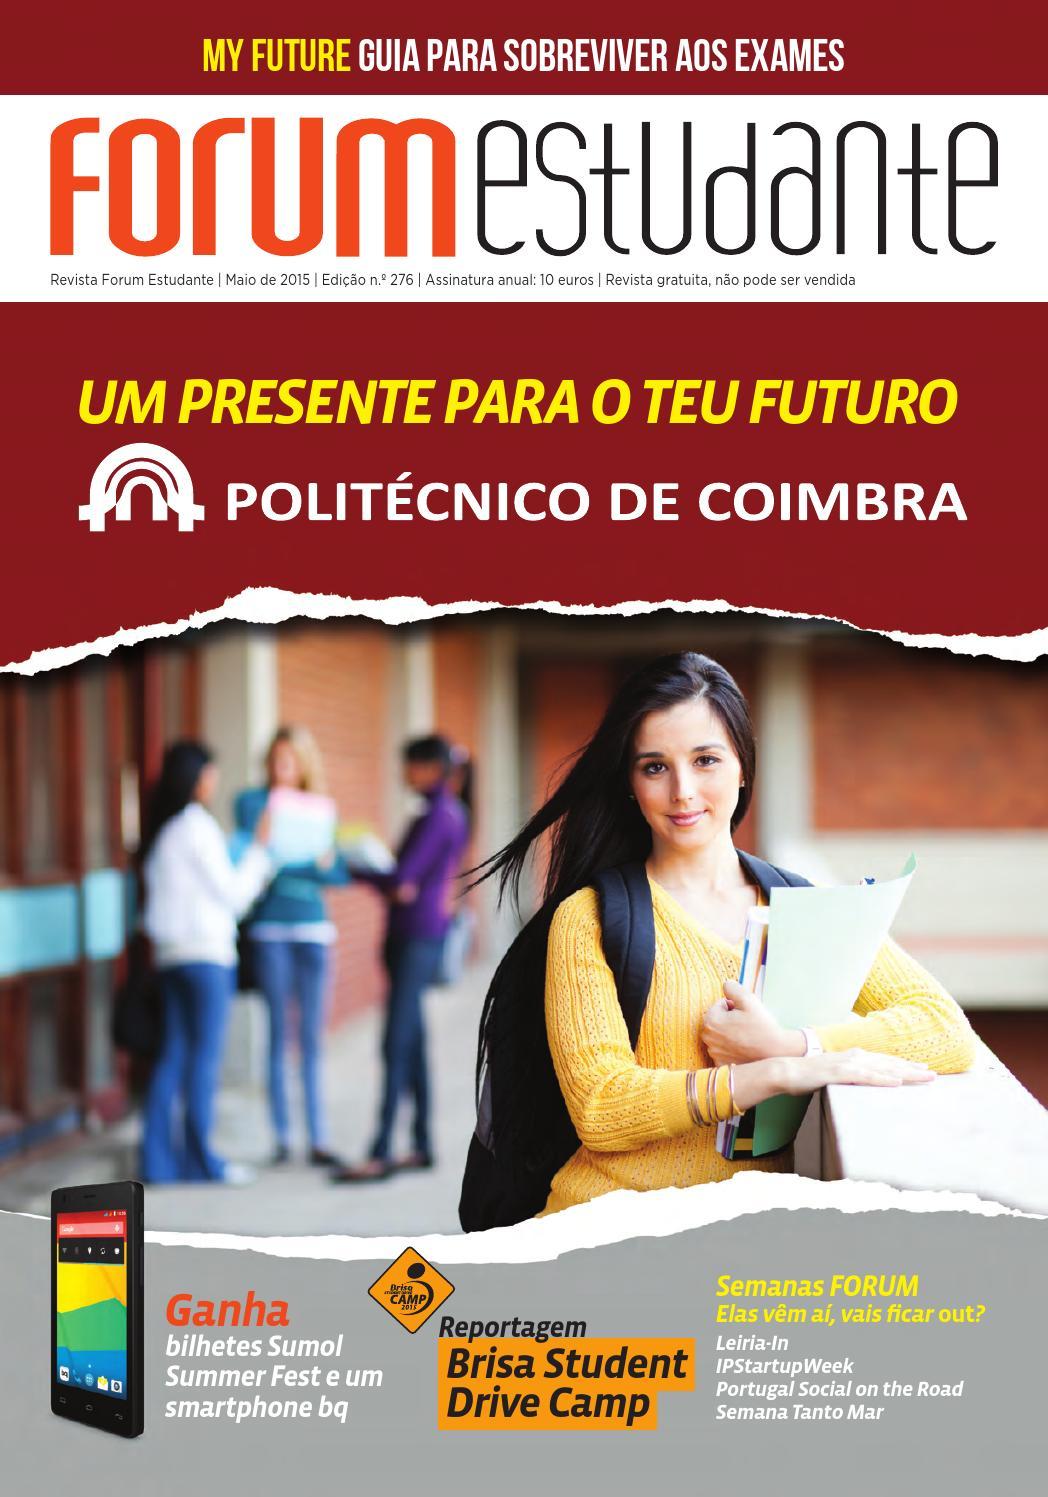 276 Revista Forum Estudante Maio 2014 By Forum Estudante Issuu